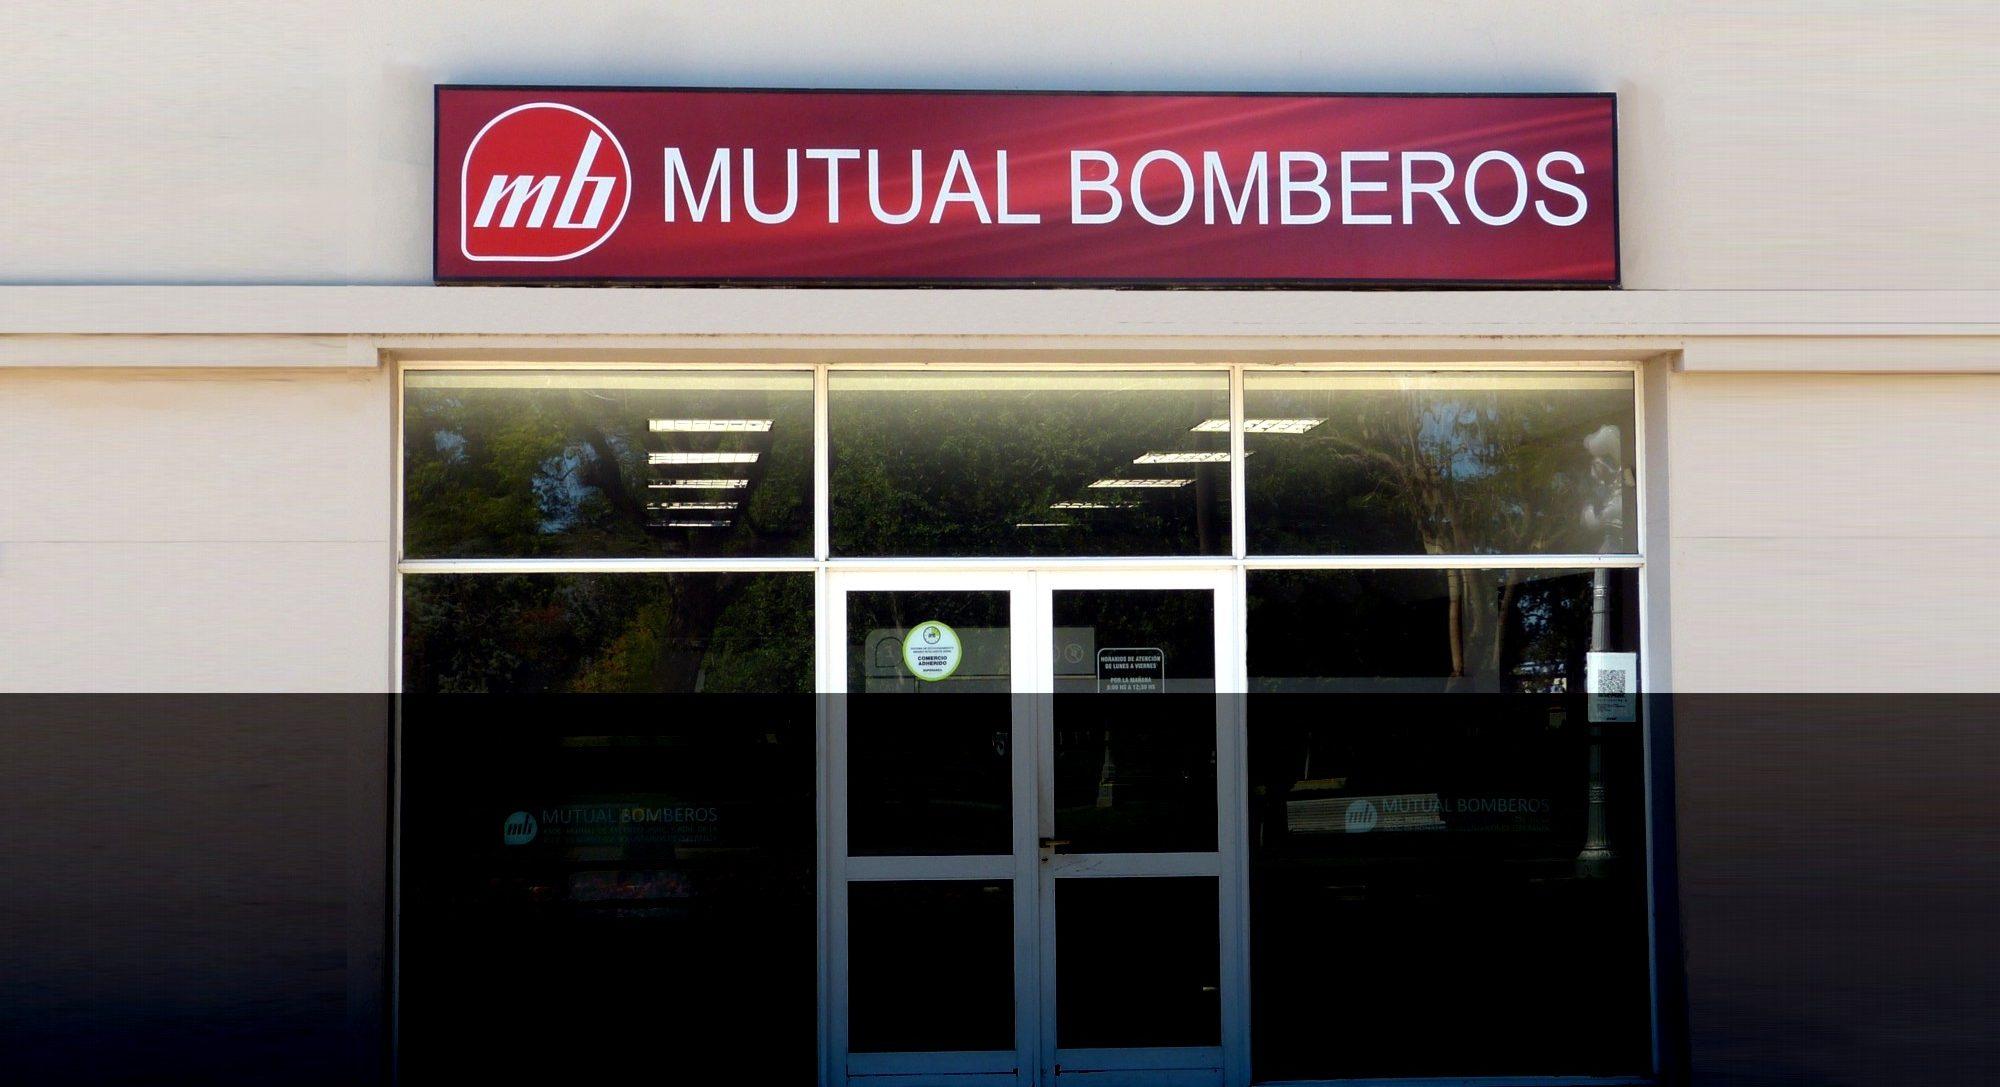 MUTUAL BOMBEROS